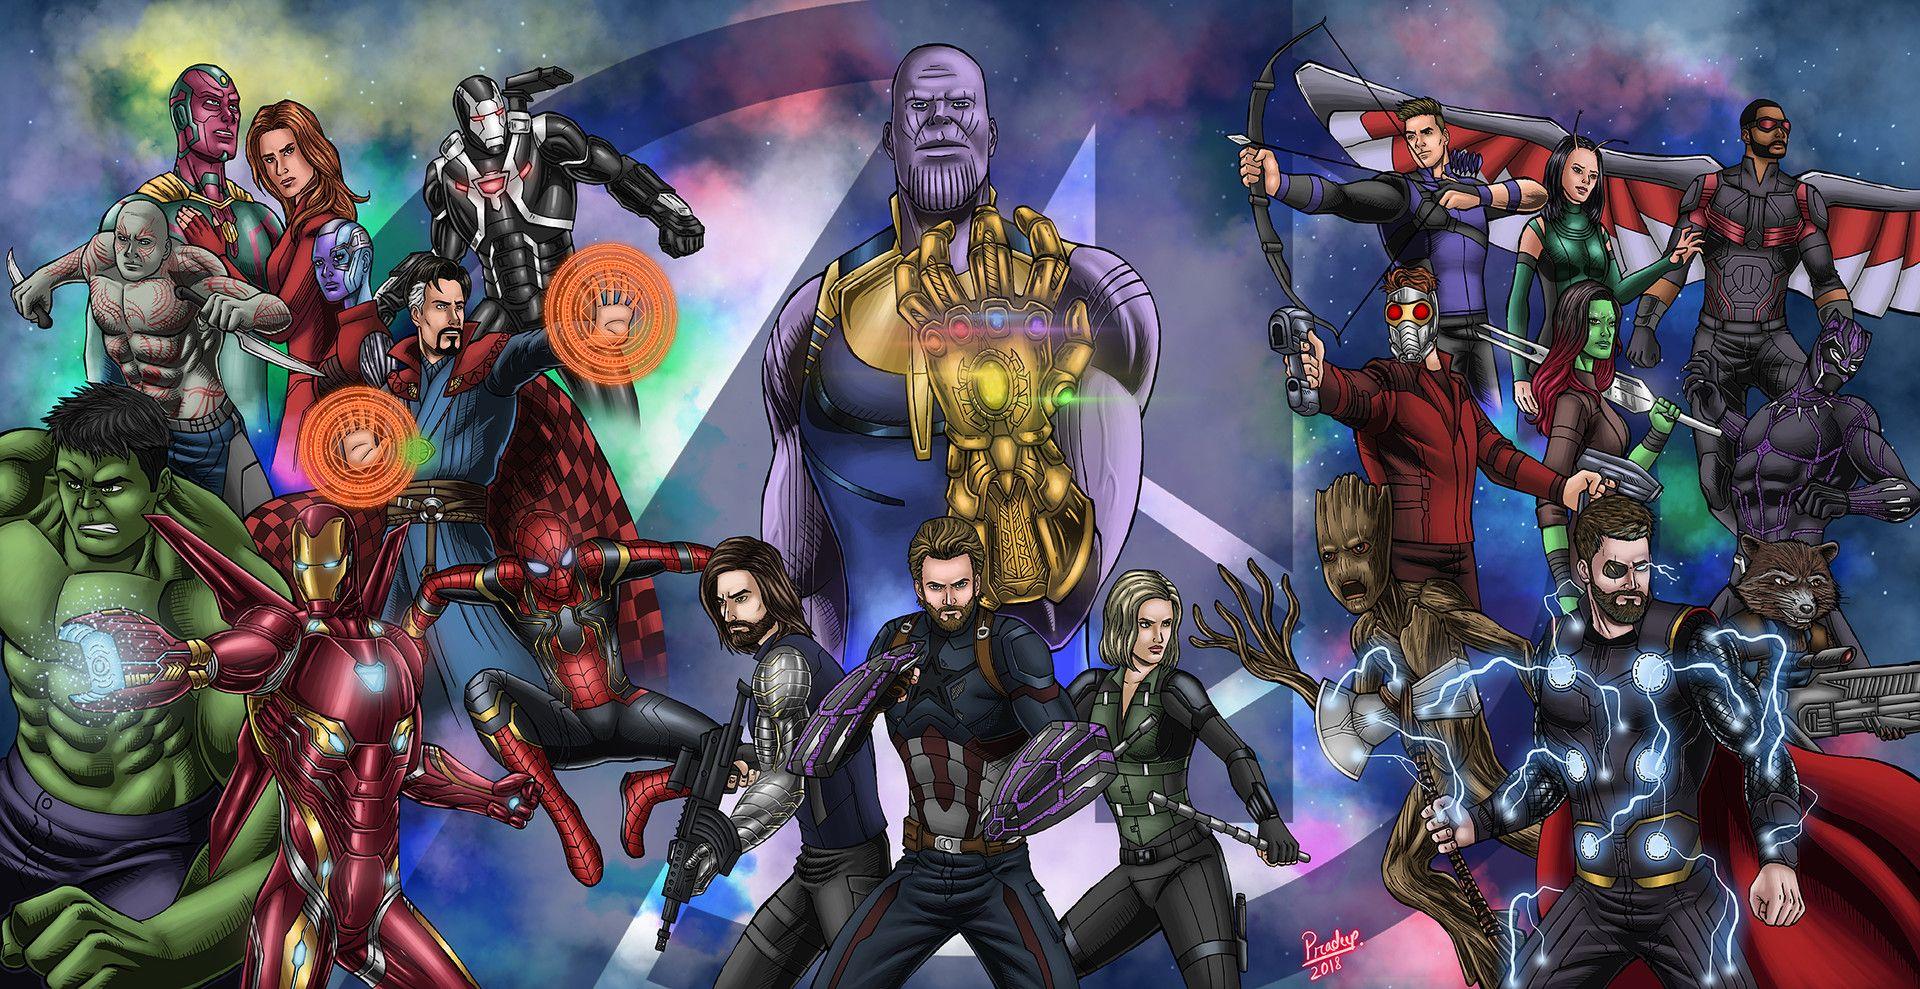 Avengers Infinity War By Pradeep Sethi Avengers Infinity War